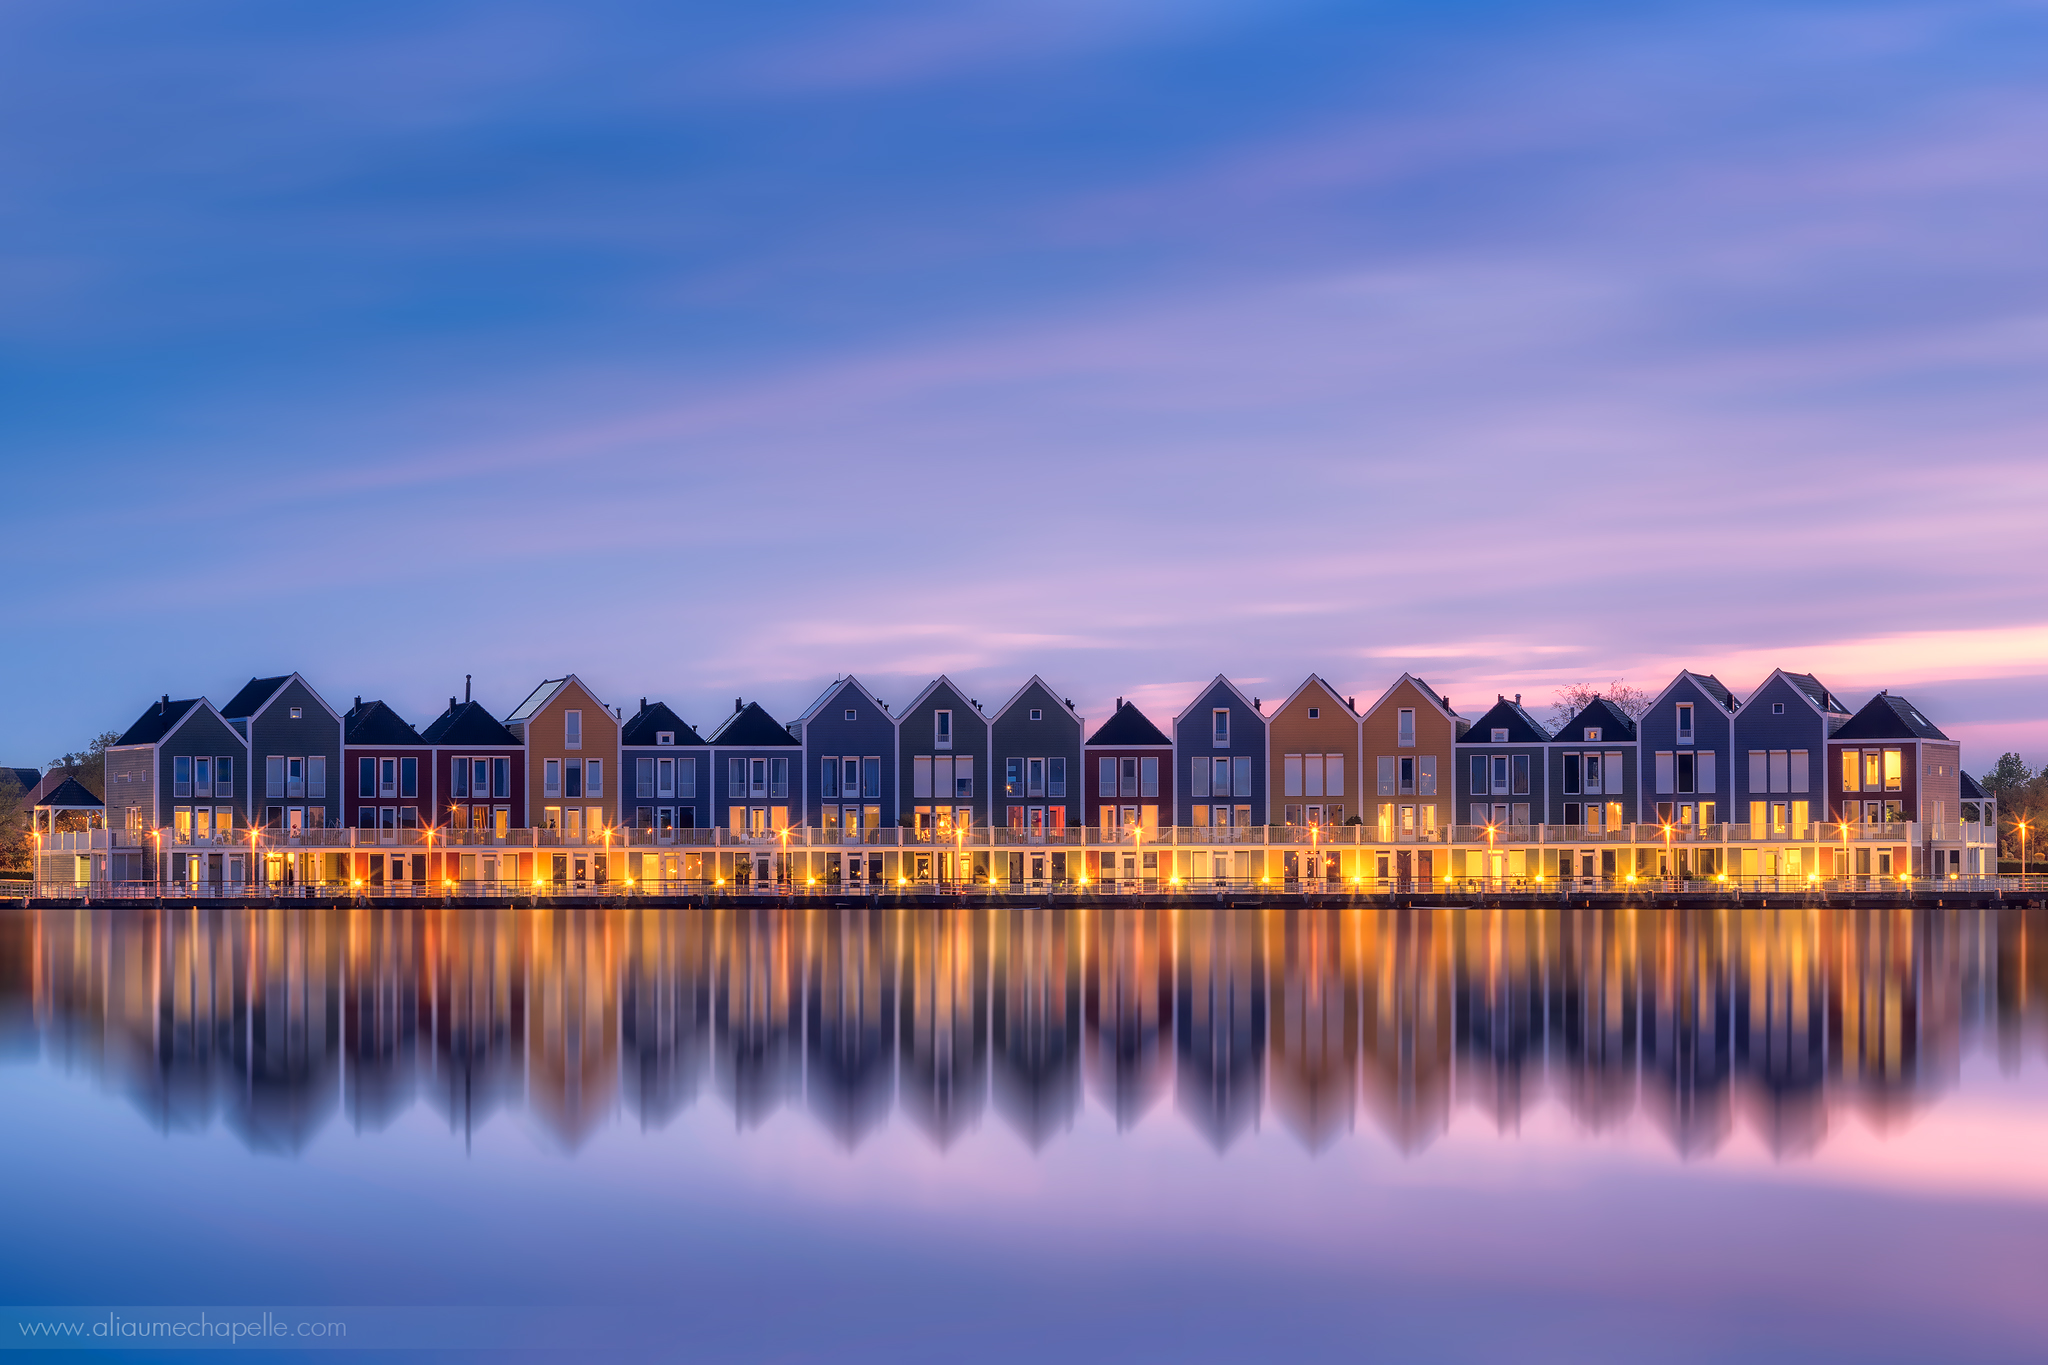 Houten rainbow houses, Netherlands